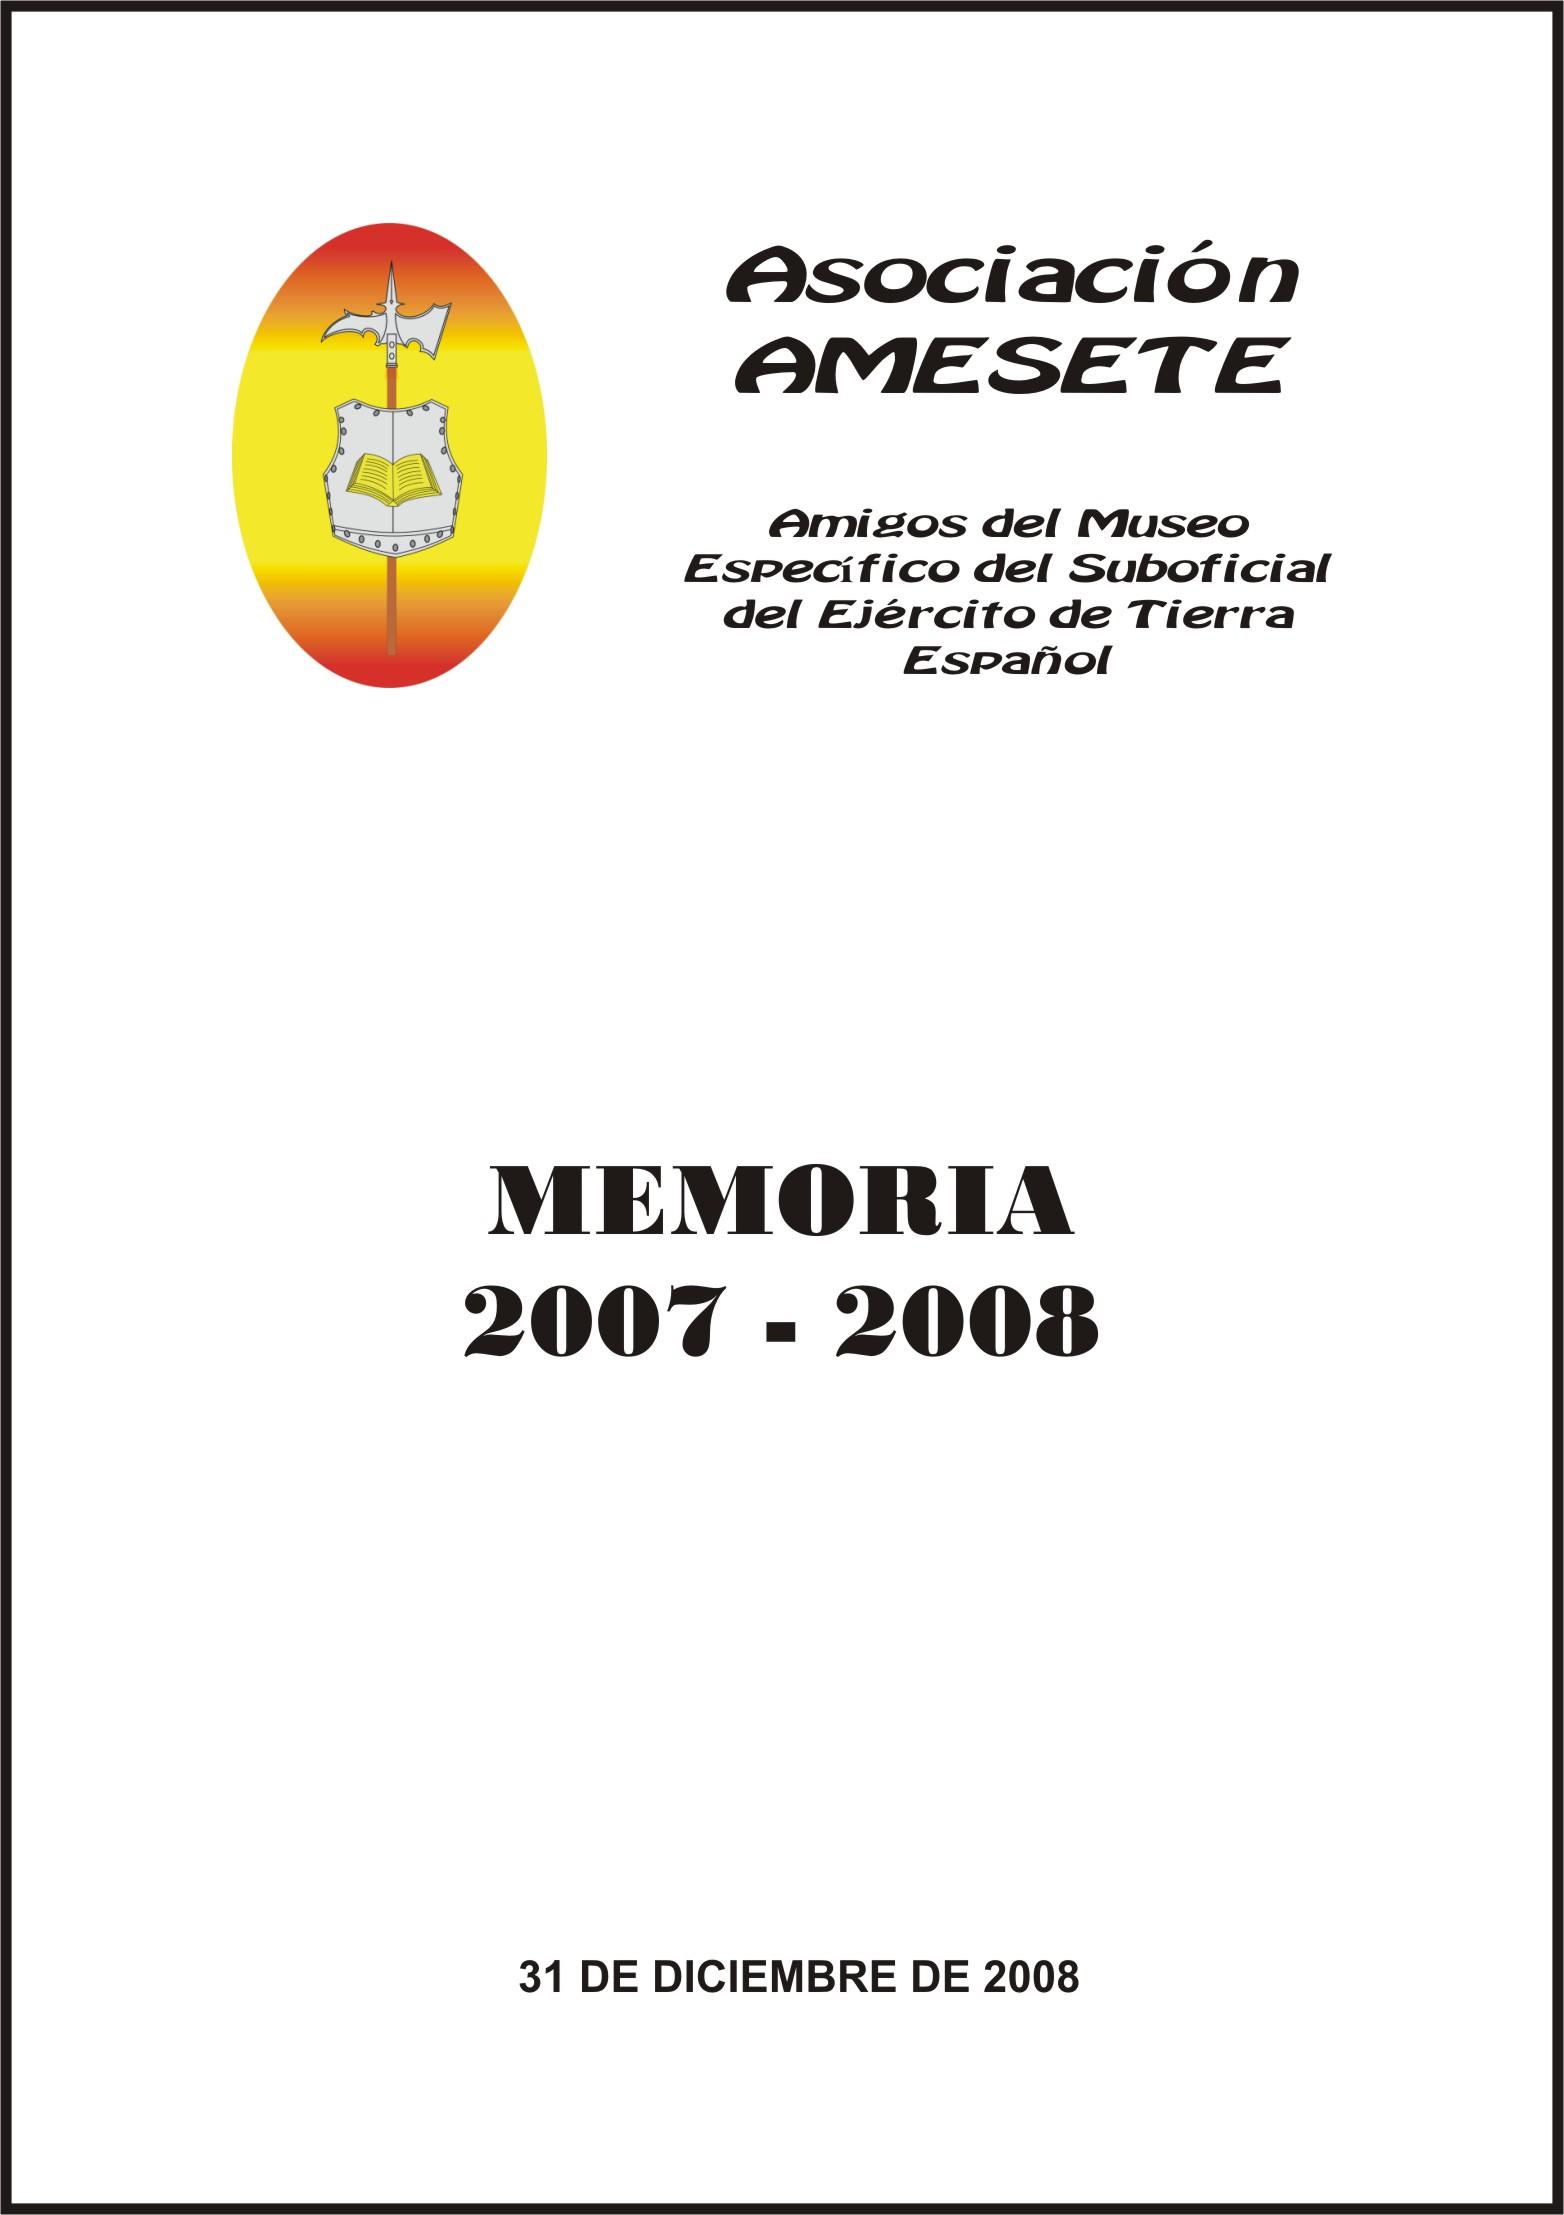 AMESETE. WEB. Memoria 2007-2008